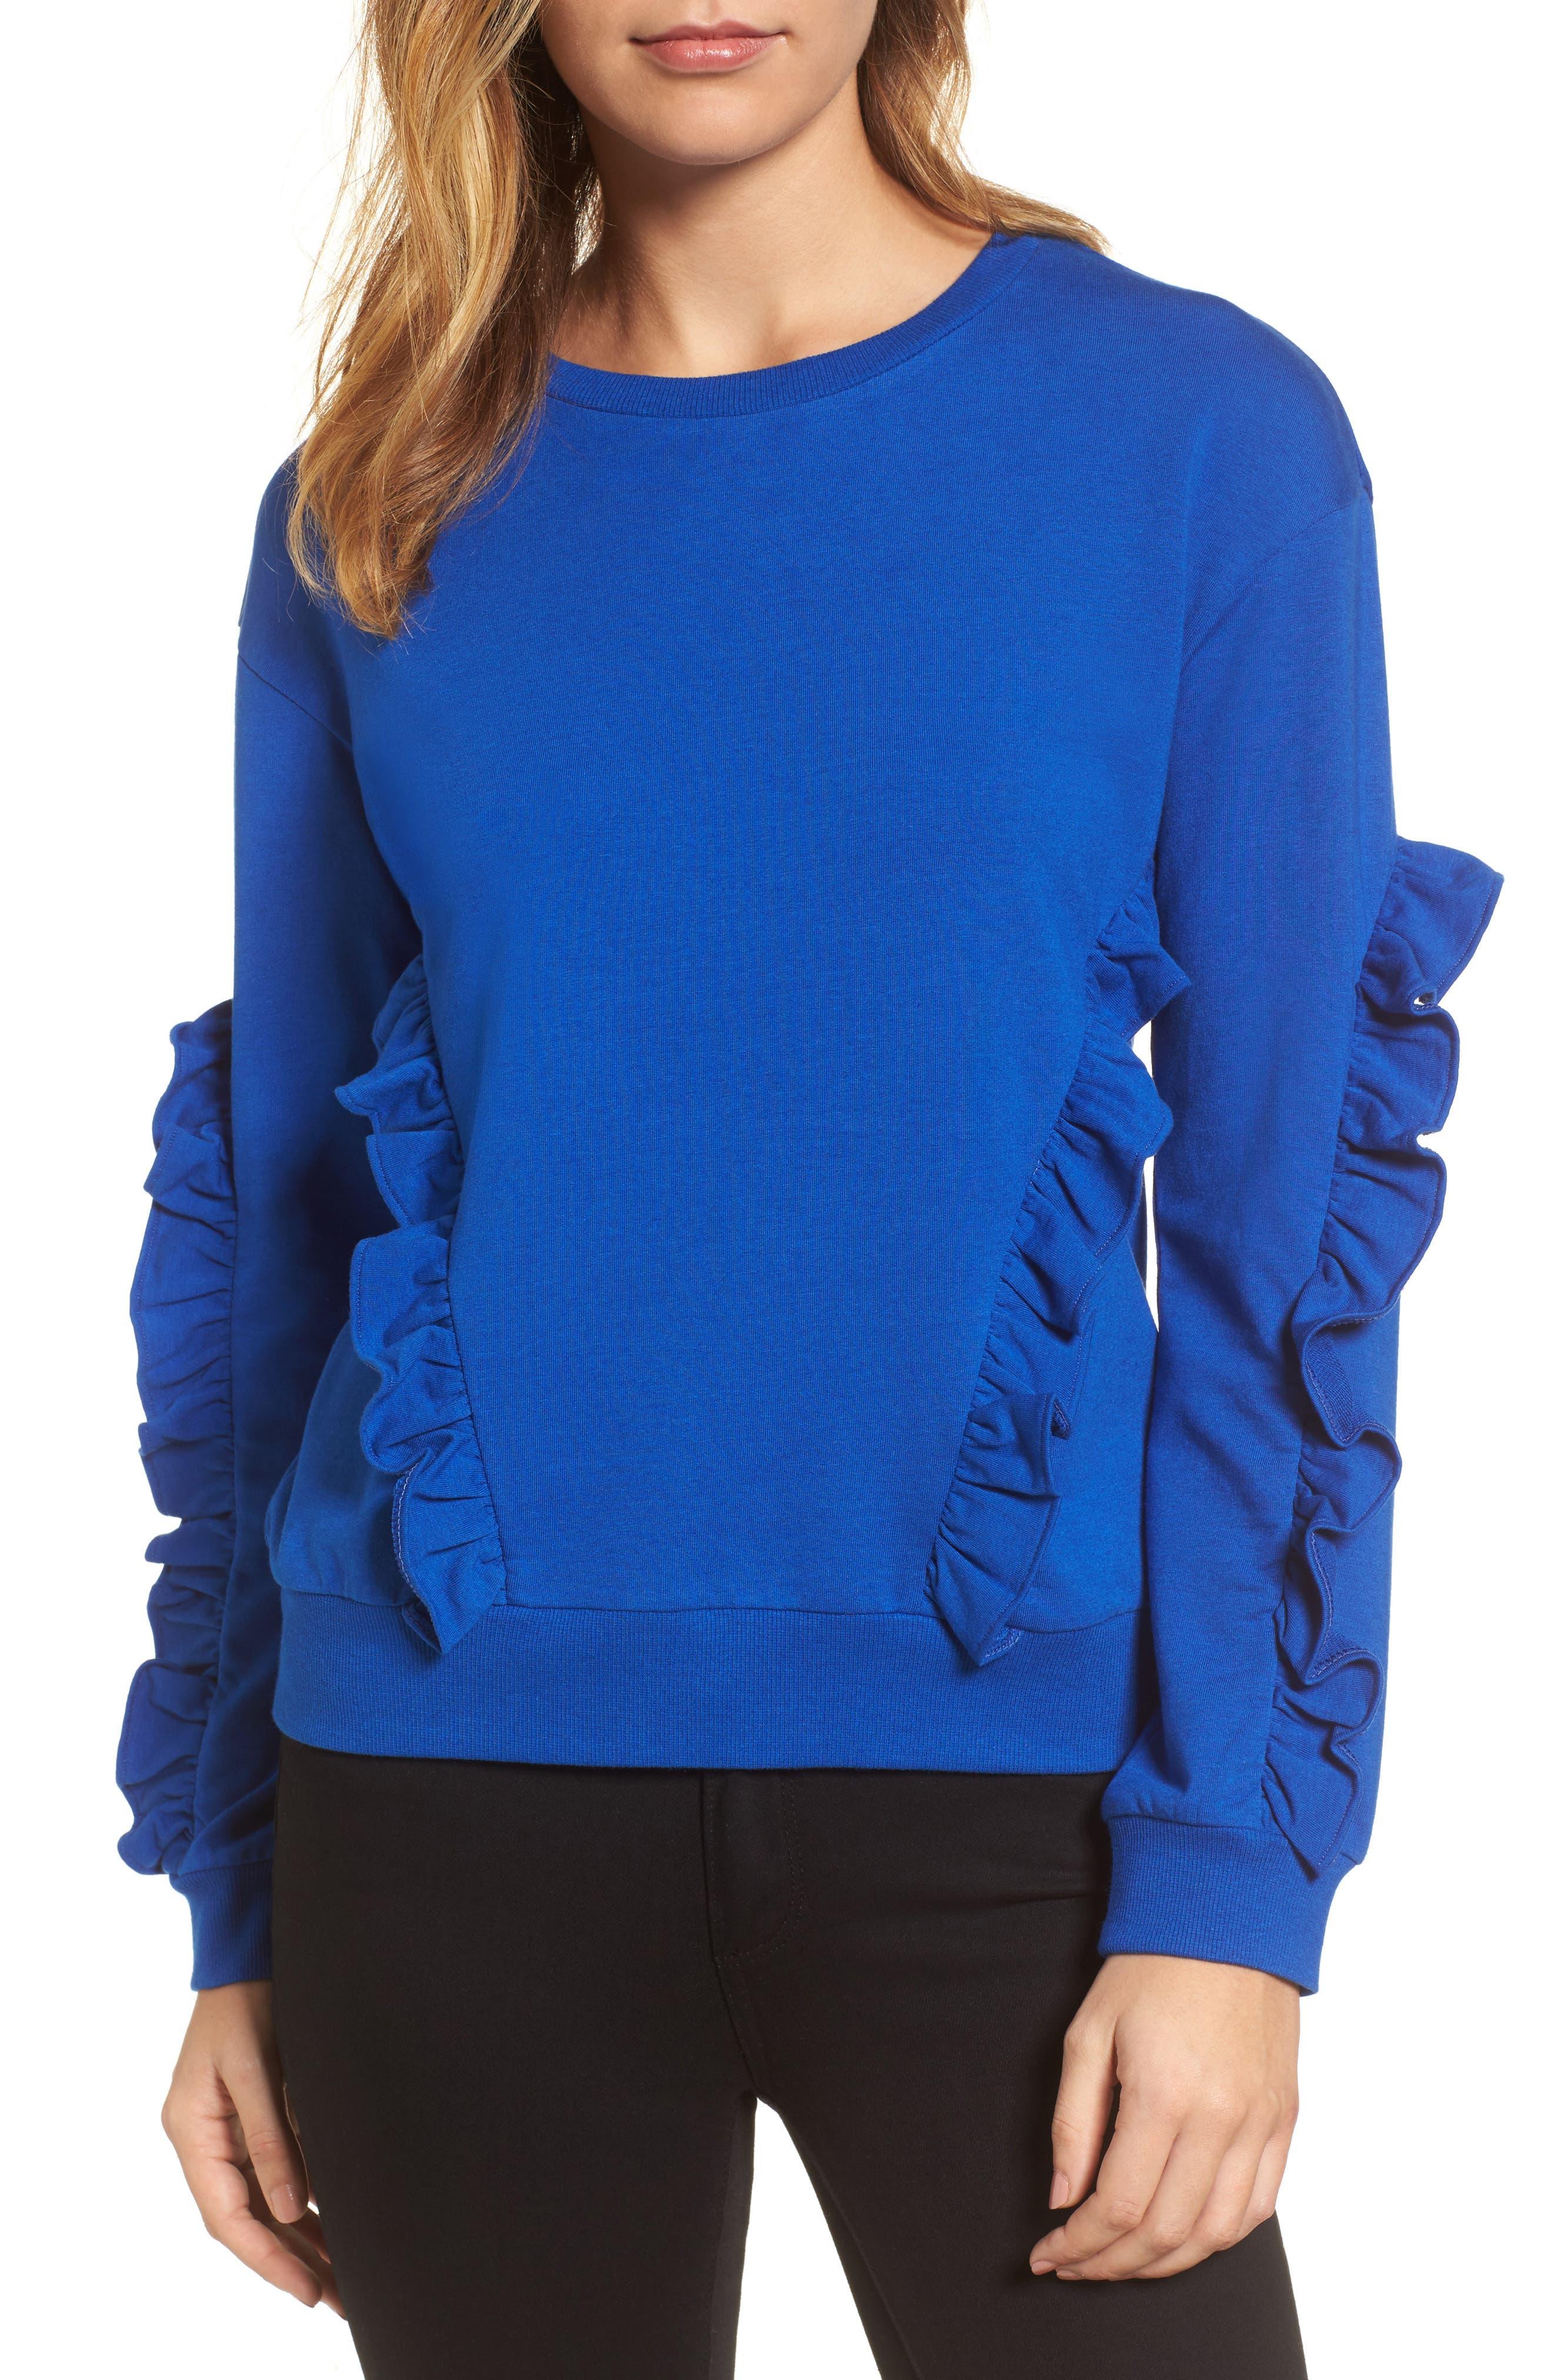 Ruffle Detail Sweatshirt,                             Main thumbnail 1, color,                             Blue Surf